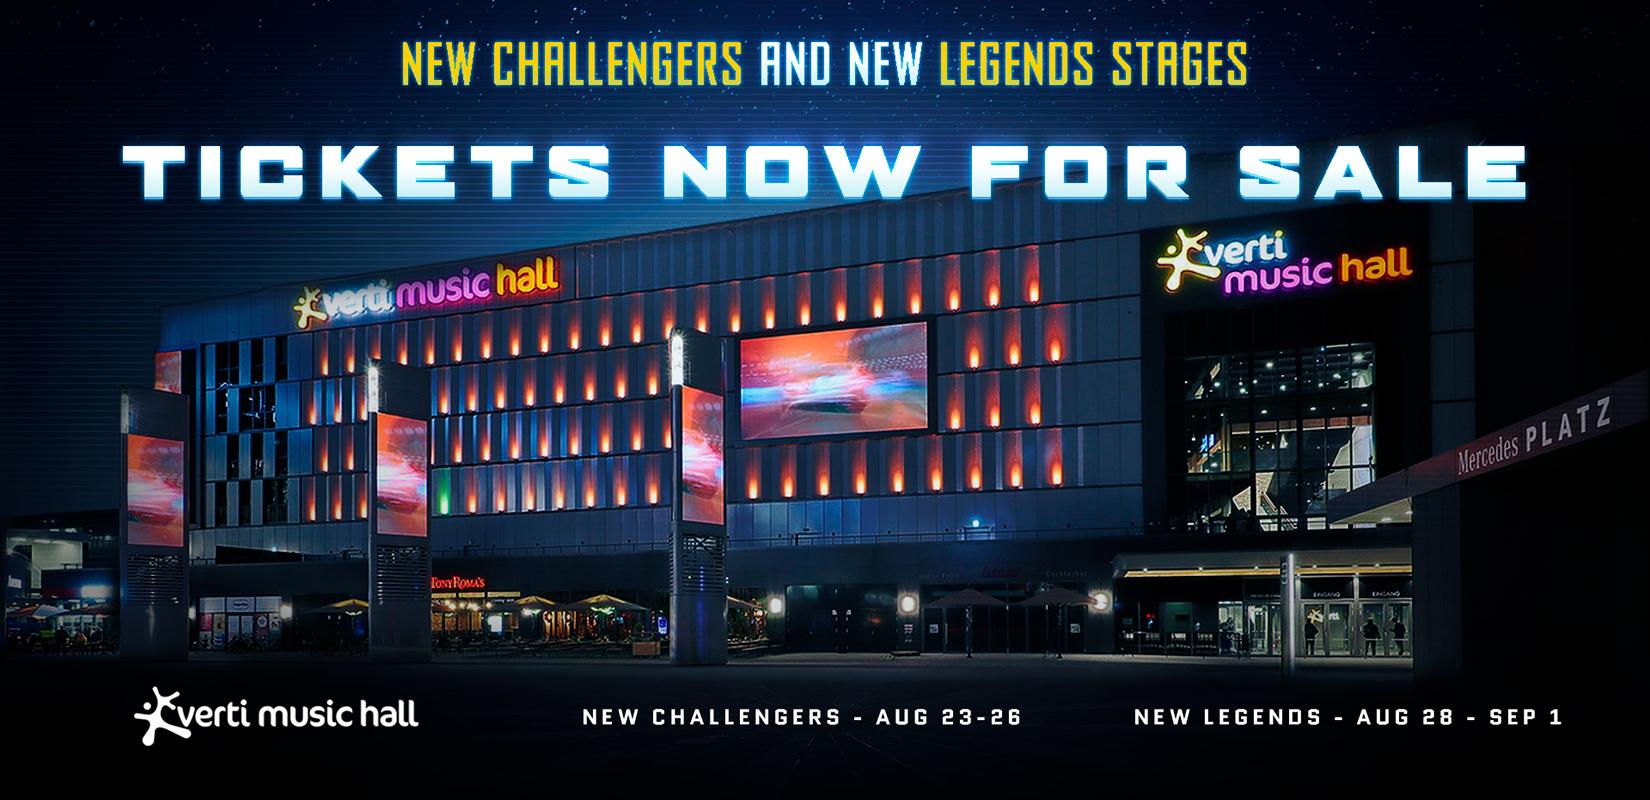 Starladder - Choose your game - starladder com